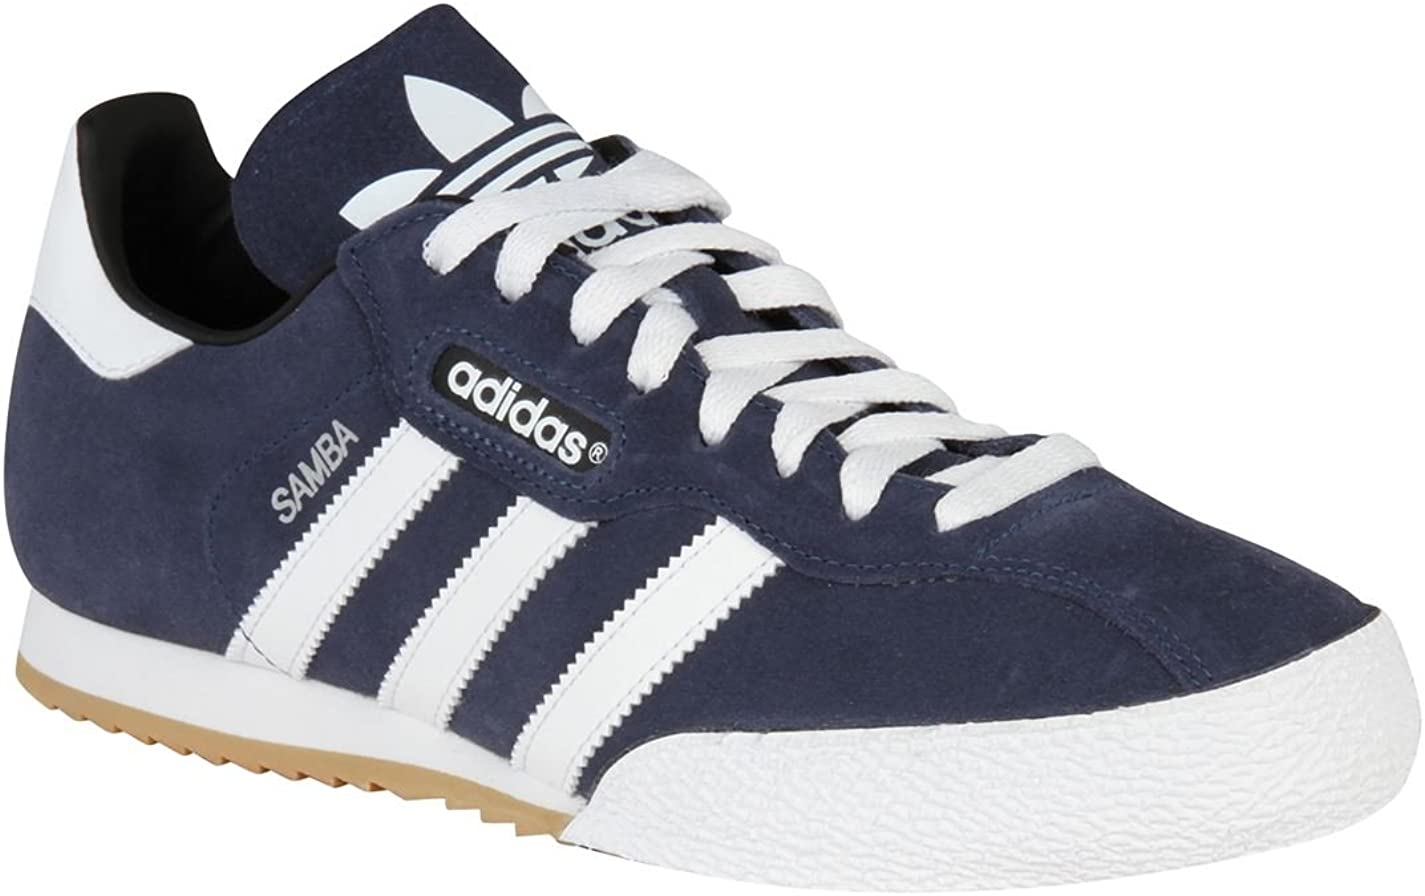 adidas samba 2014 Adidas original chaussures,adidas original